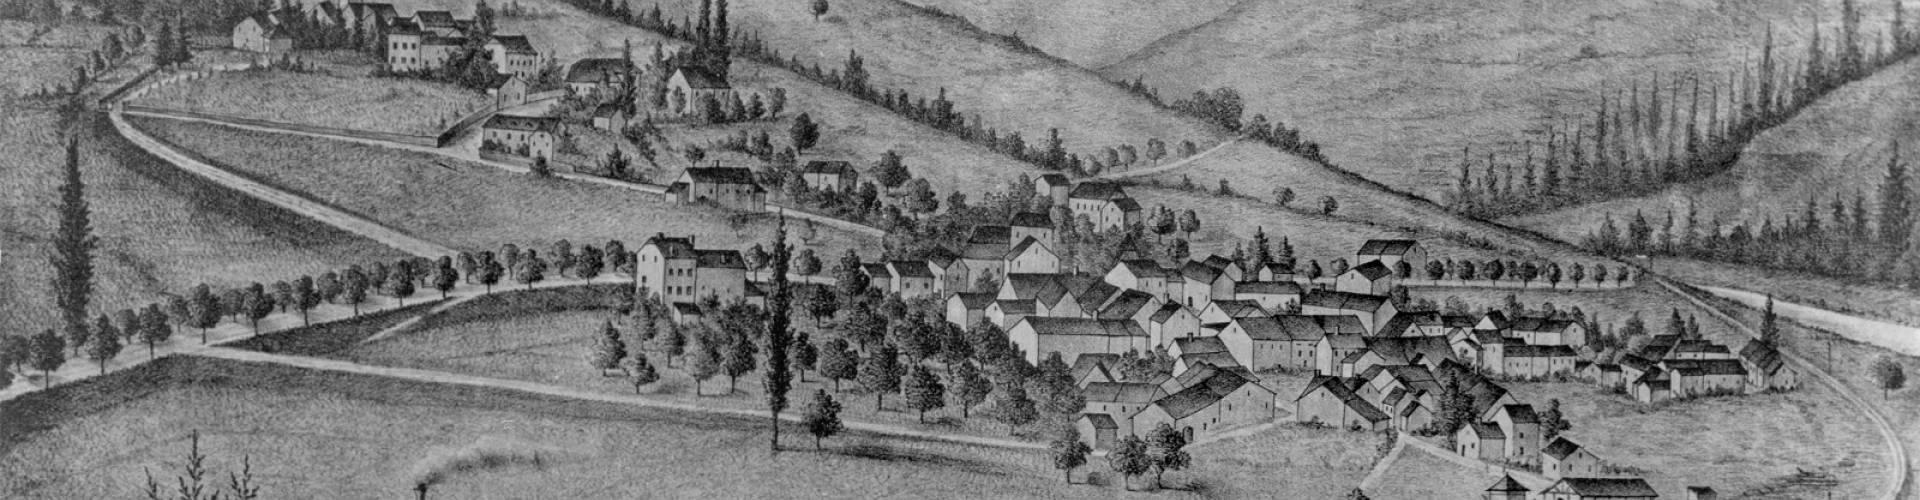 rosport 1882 web